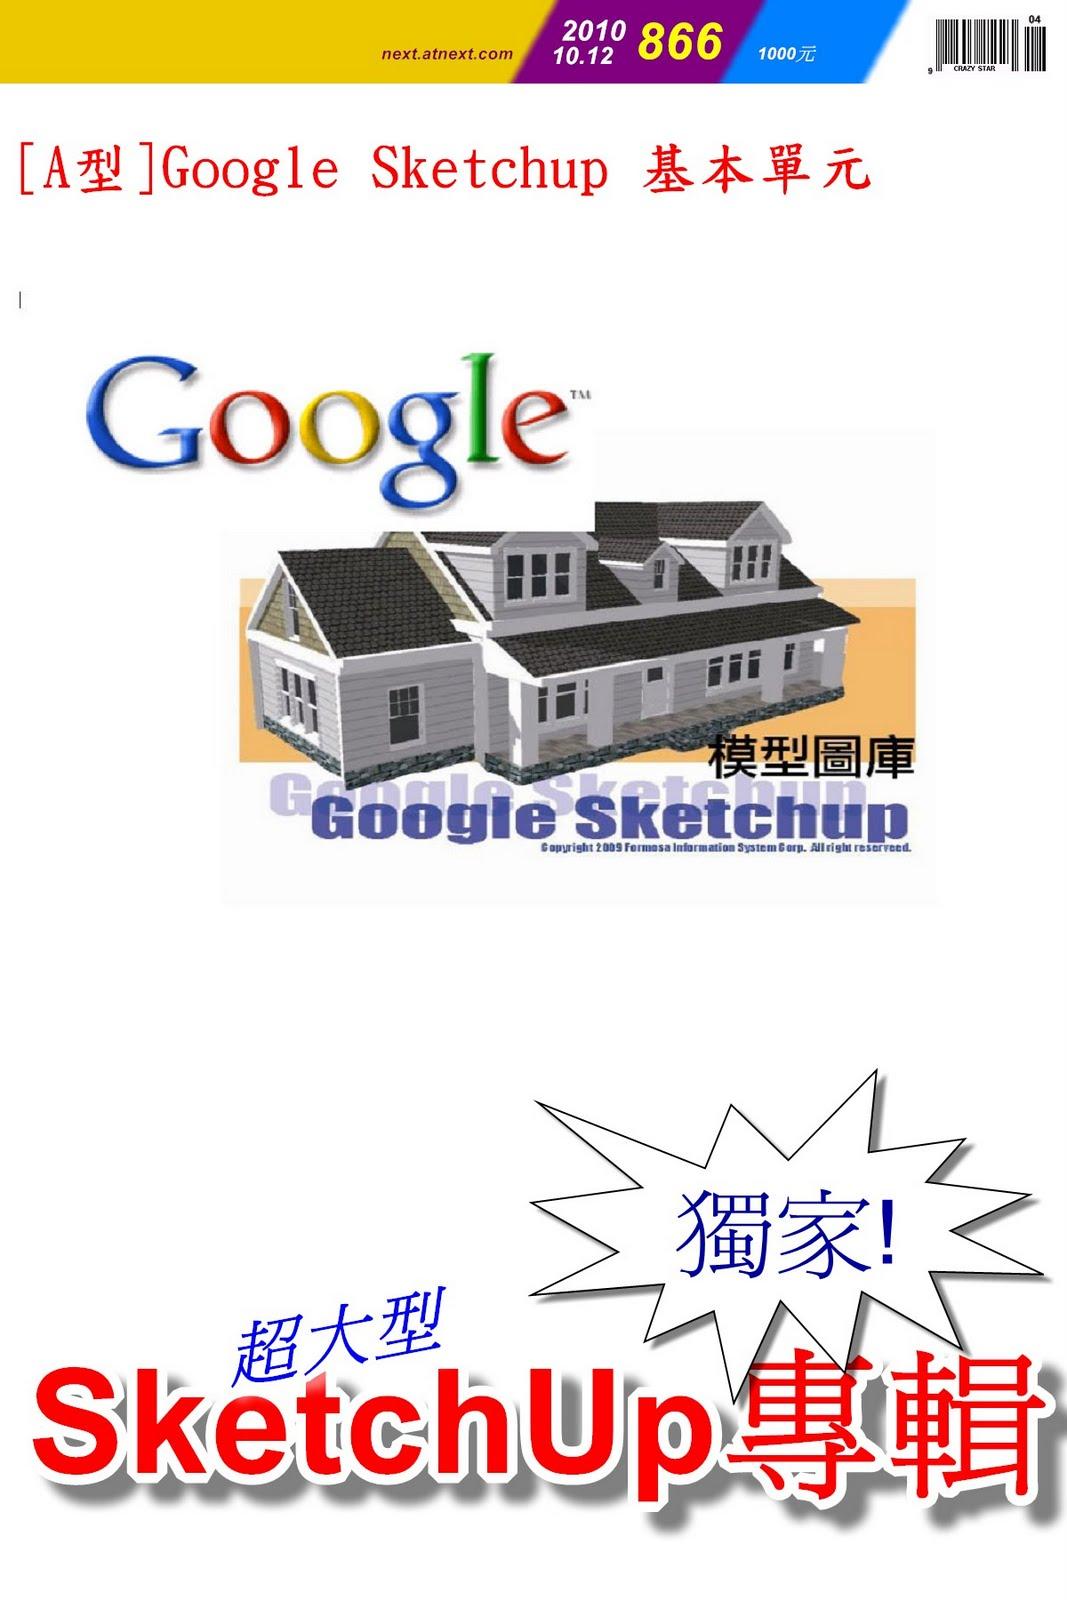 SketchUp Autocad 模型庫: [A型]Google Sketchup 基本單元 模型庫/素材/ 圖庫[蒐集+整理]